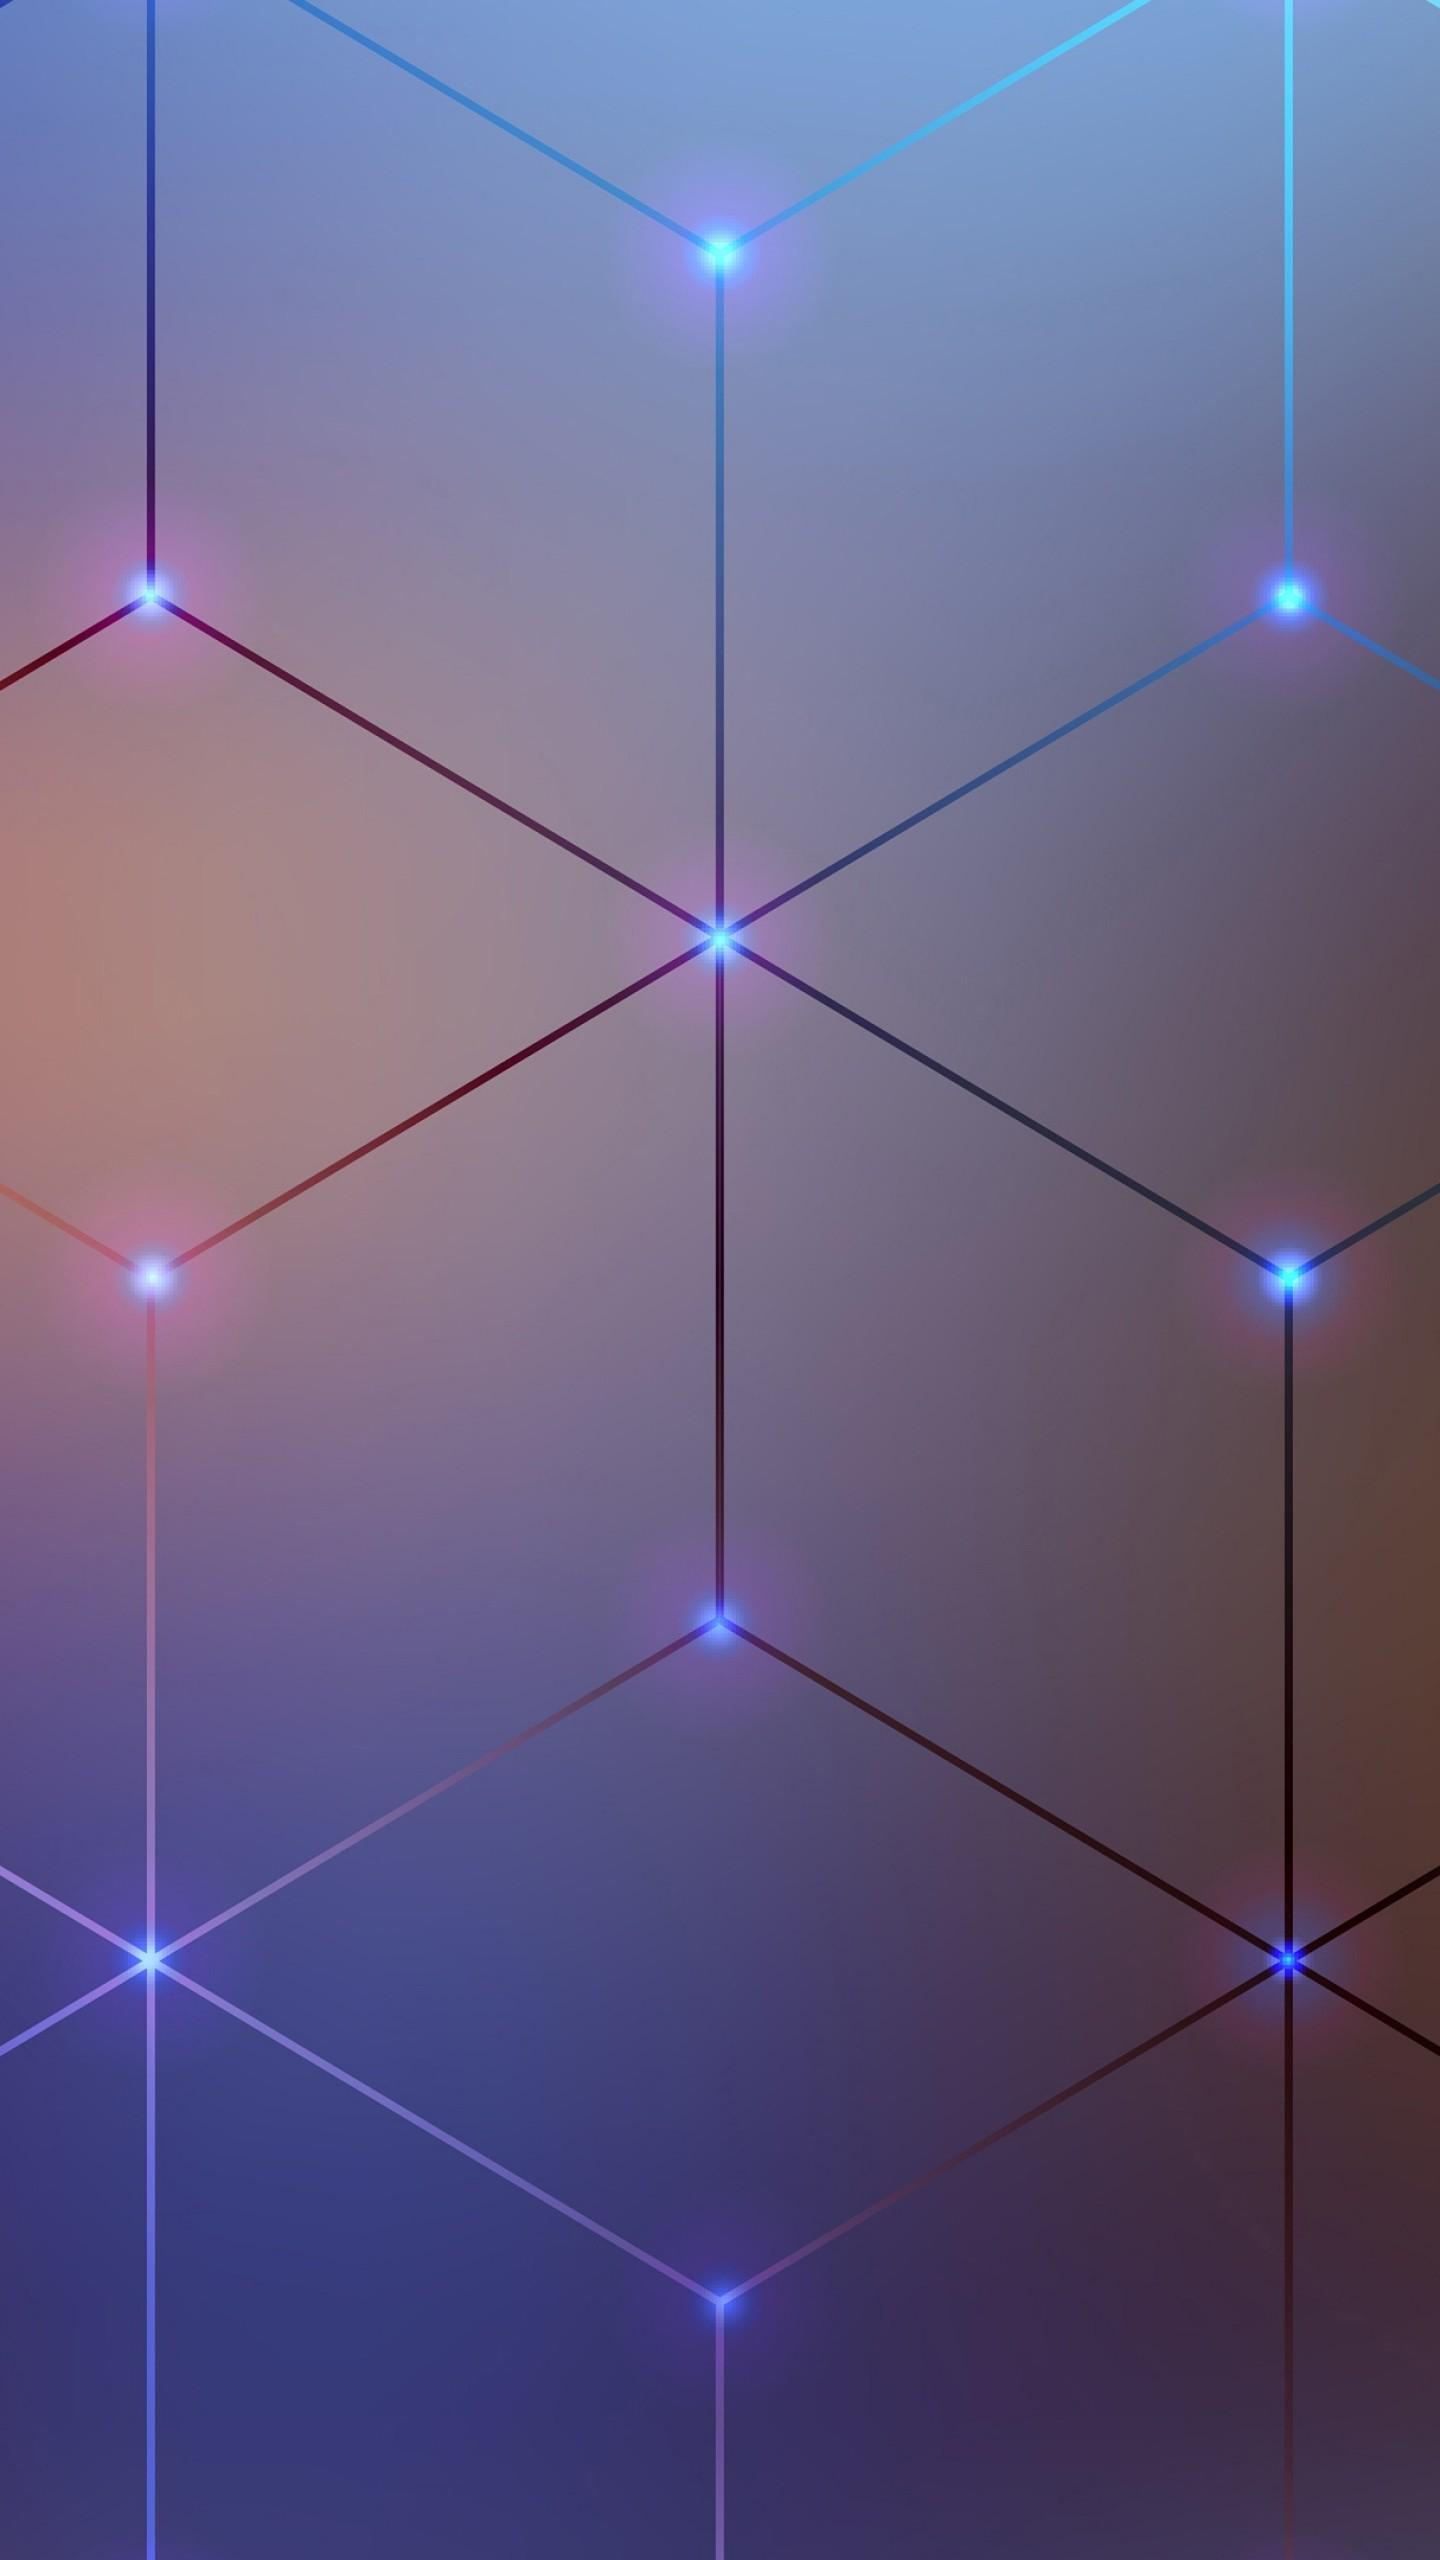 wallpaper spectrum electromagnetic  lines  4k  5k  android